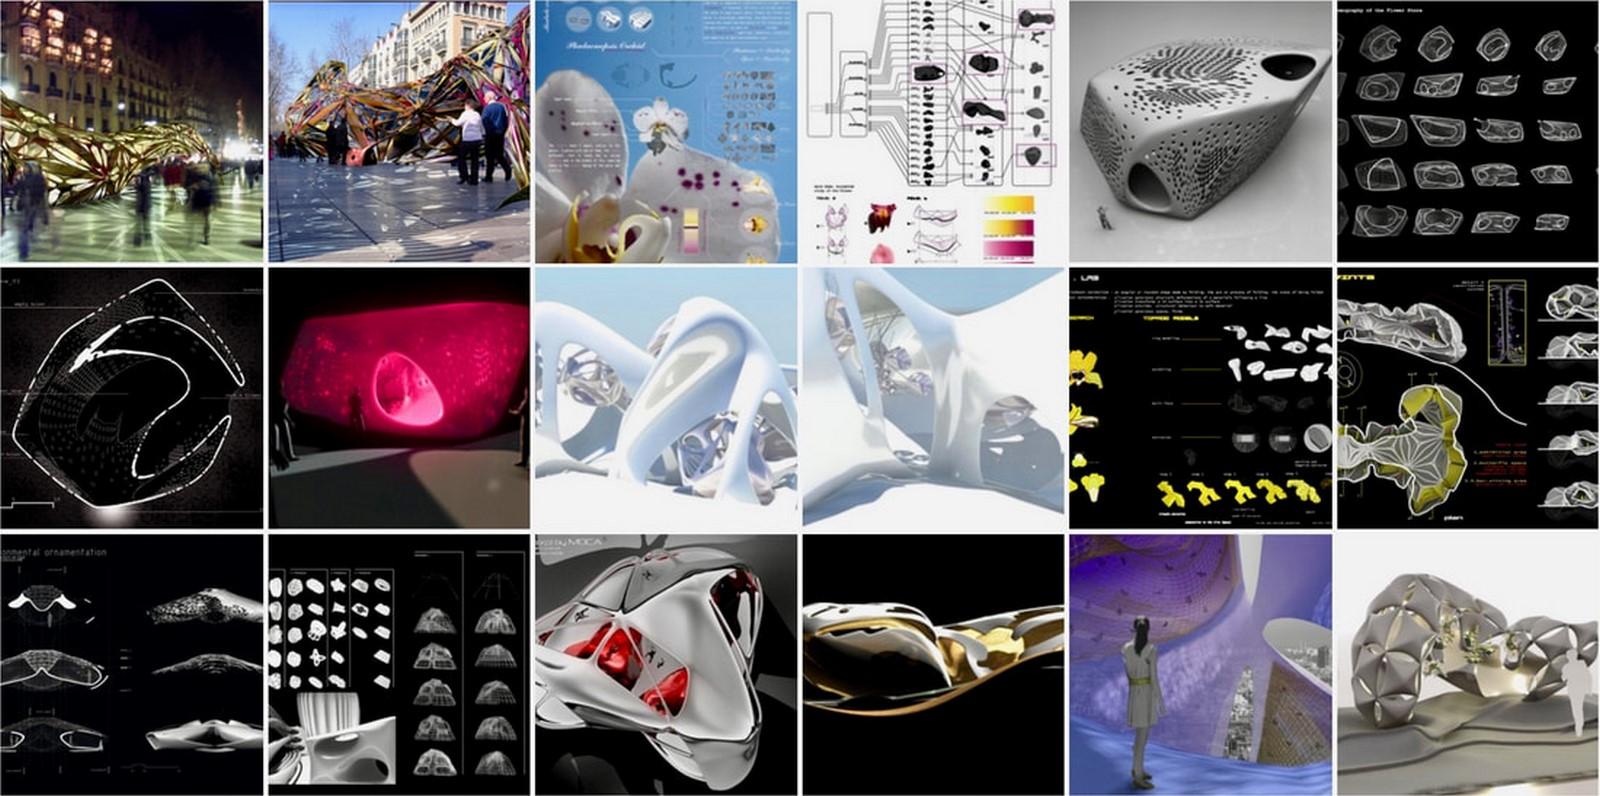 The Future of Architecture: Biodigital Architecture and Genetics - Sheet2